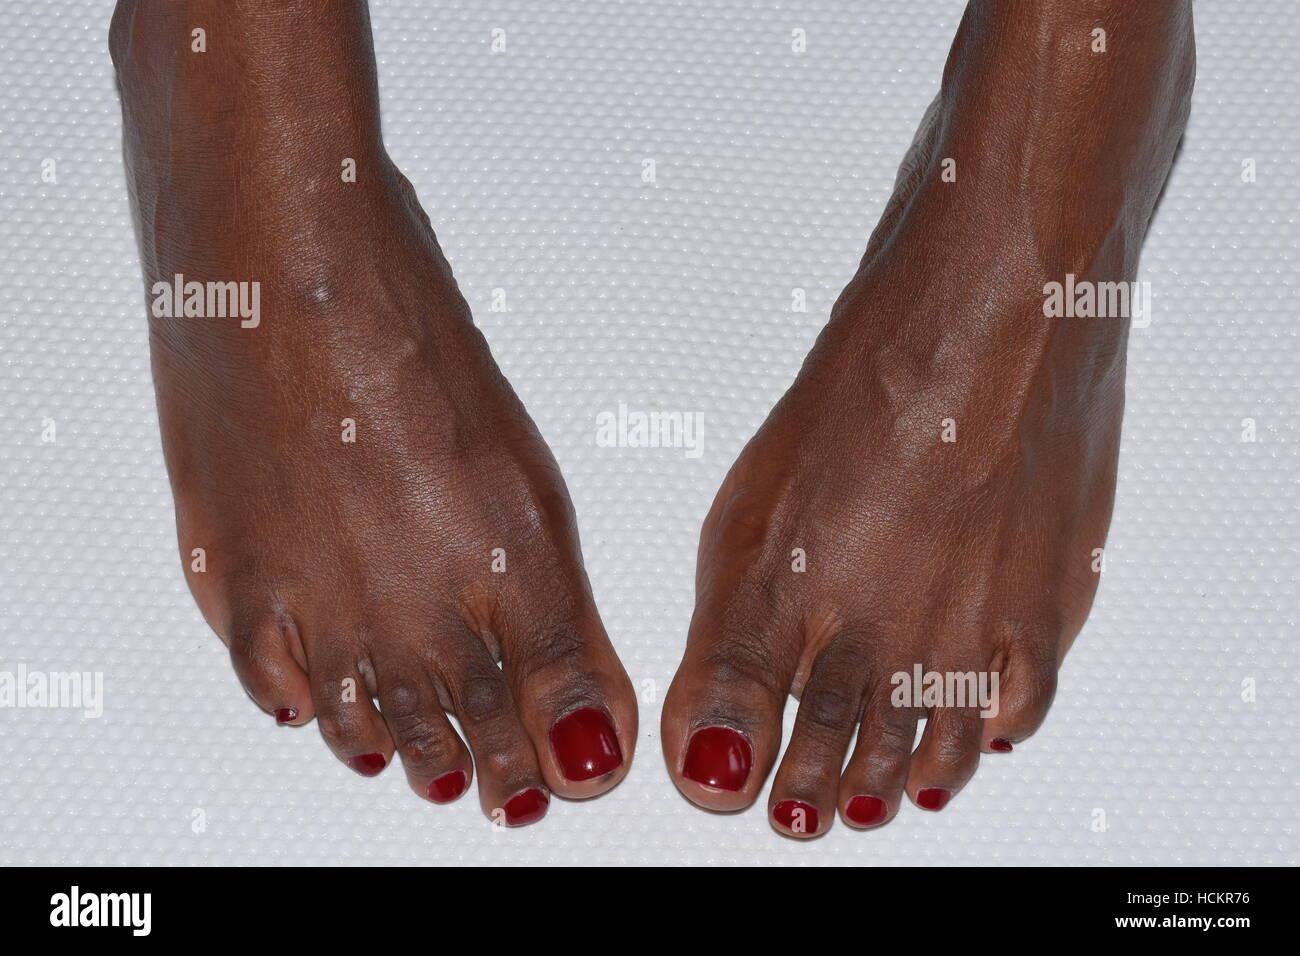 Healthy female feet pedicured - Stock Image